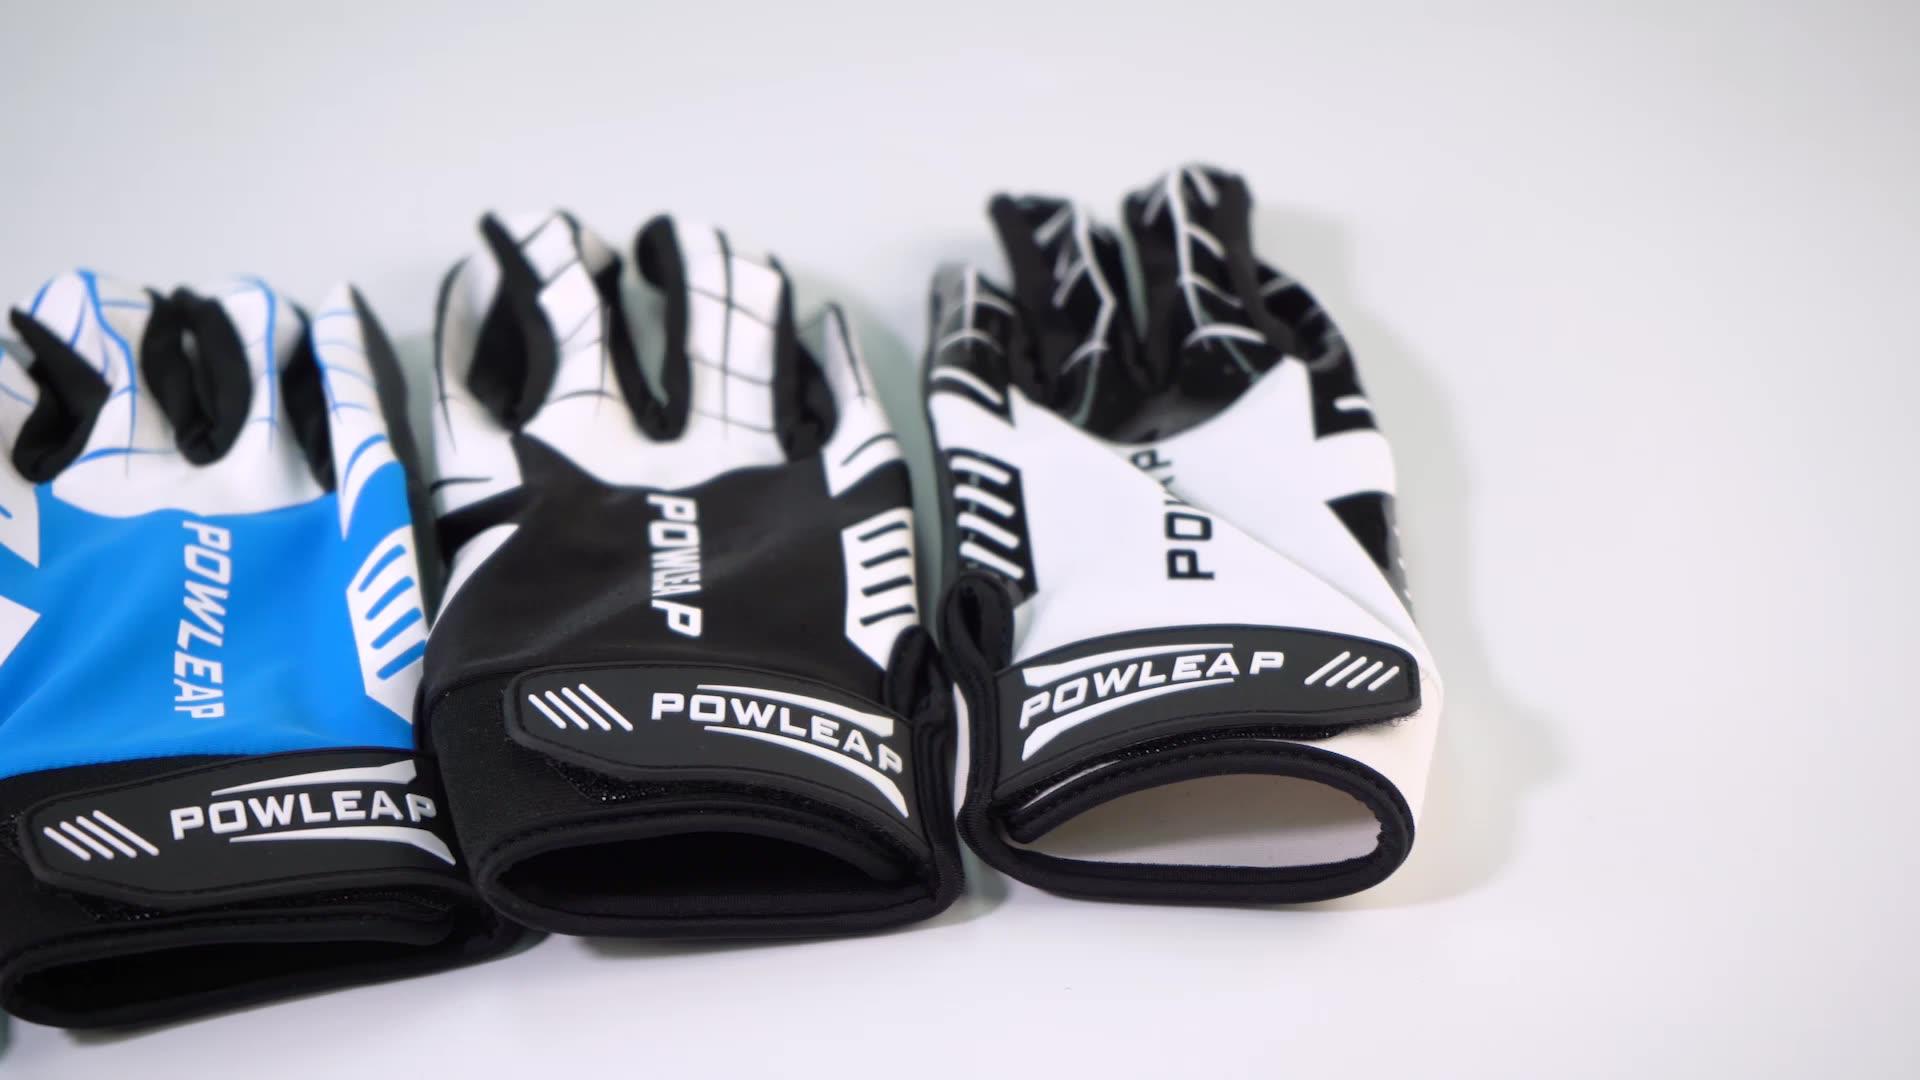 Stretchable Breathable Baseball Batting Gloves Comfortable Leather Softball Sports Gloves Men Women